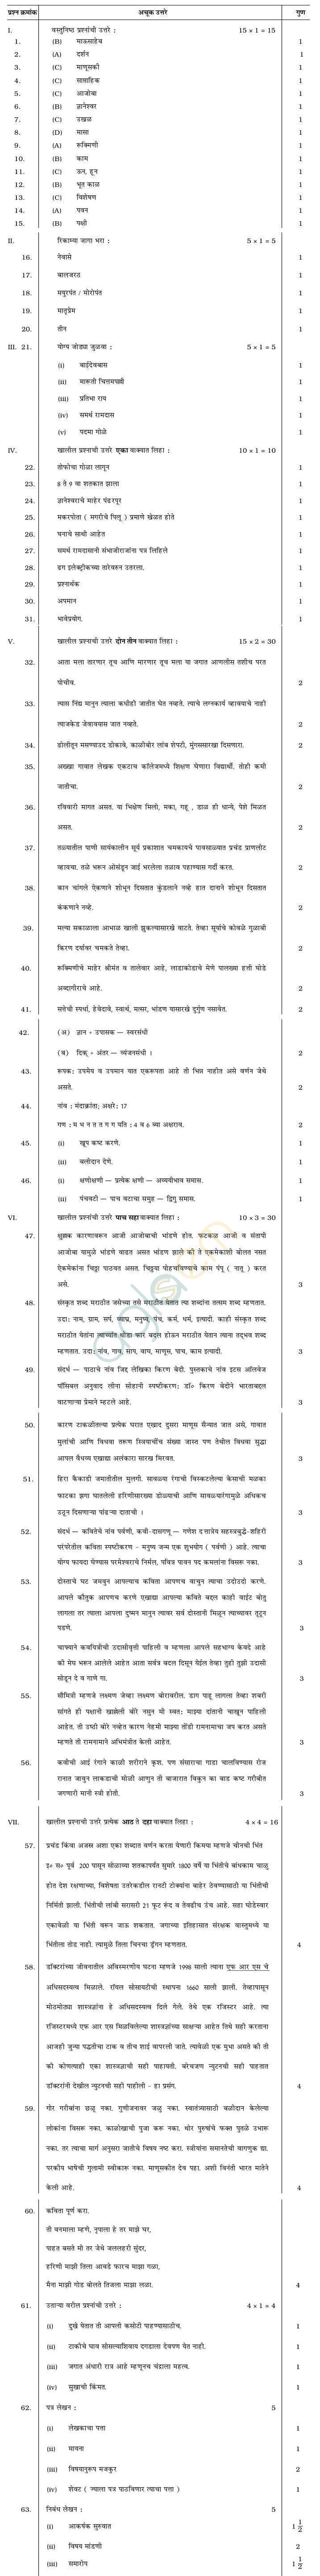 Karnataka SSLC Solved Question Paper April 2014 - Marathi